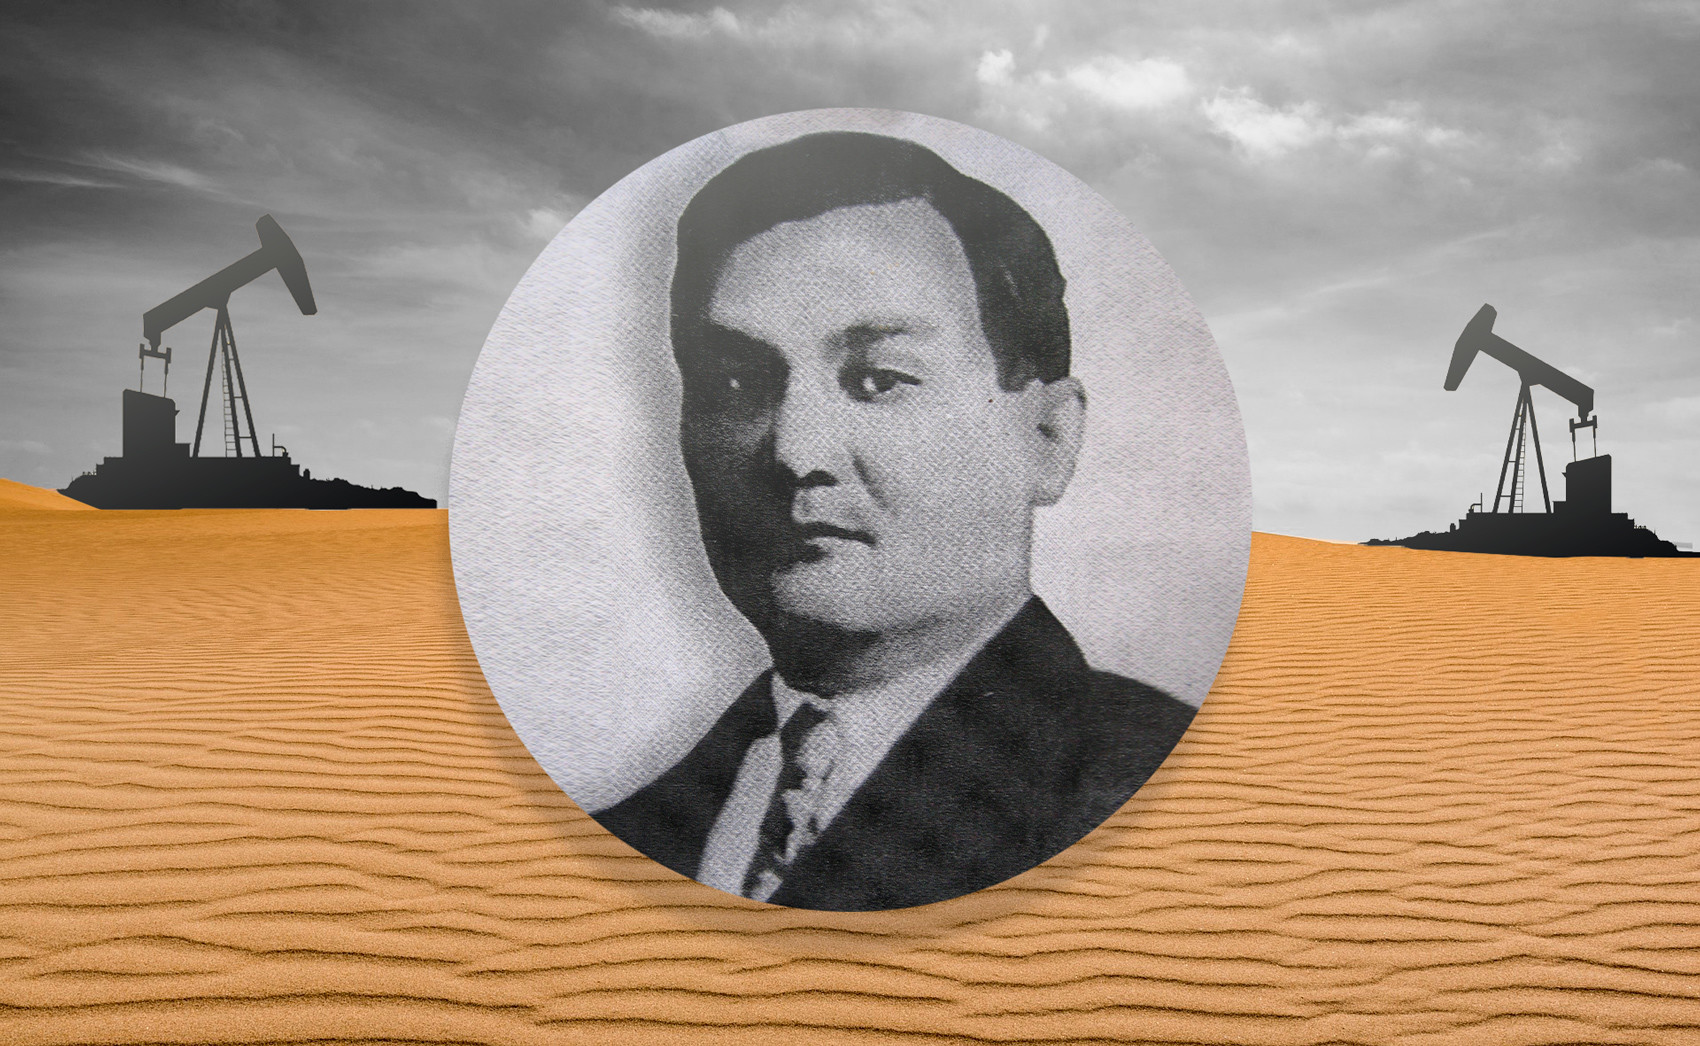 Nasir Tjurjakulow